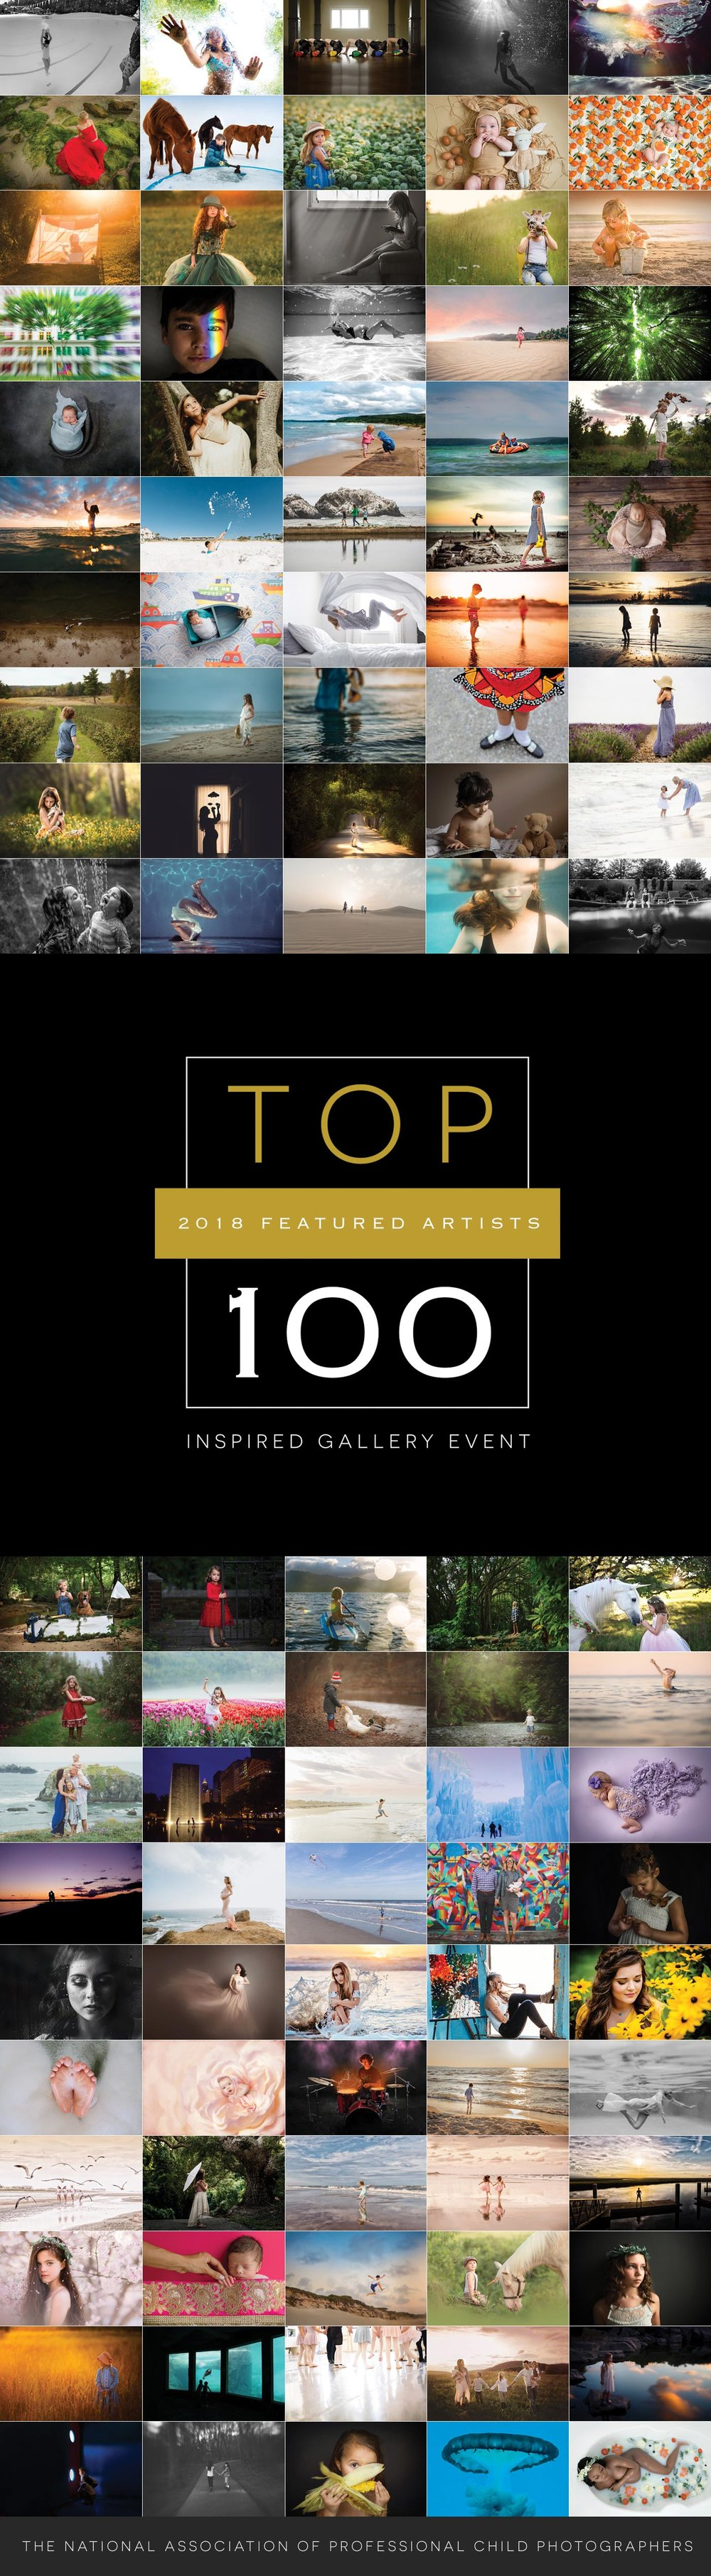 Top100Blog.jpg